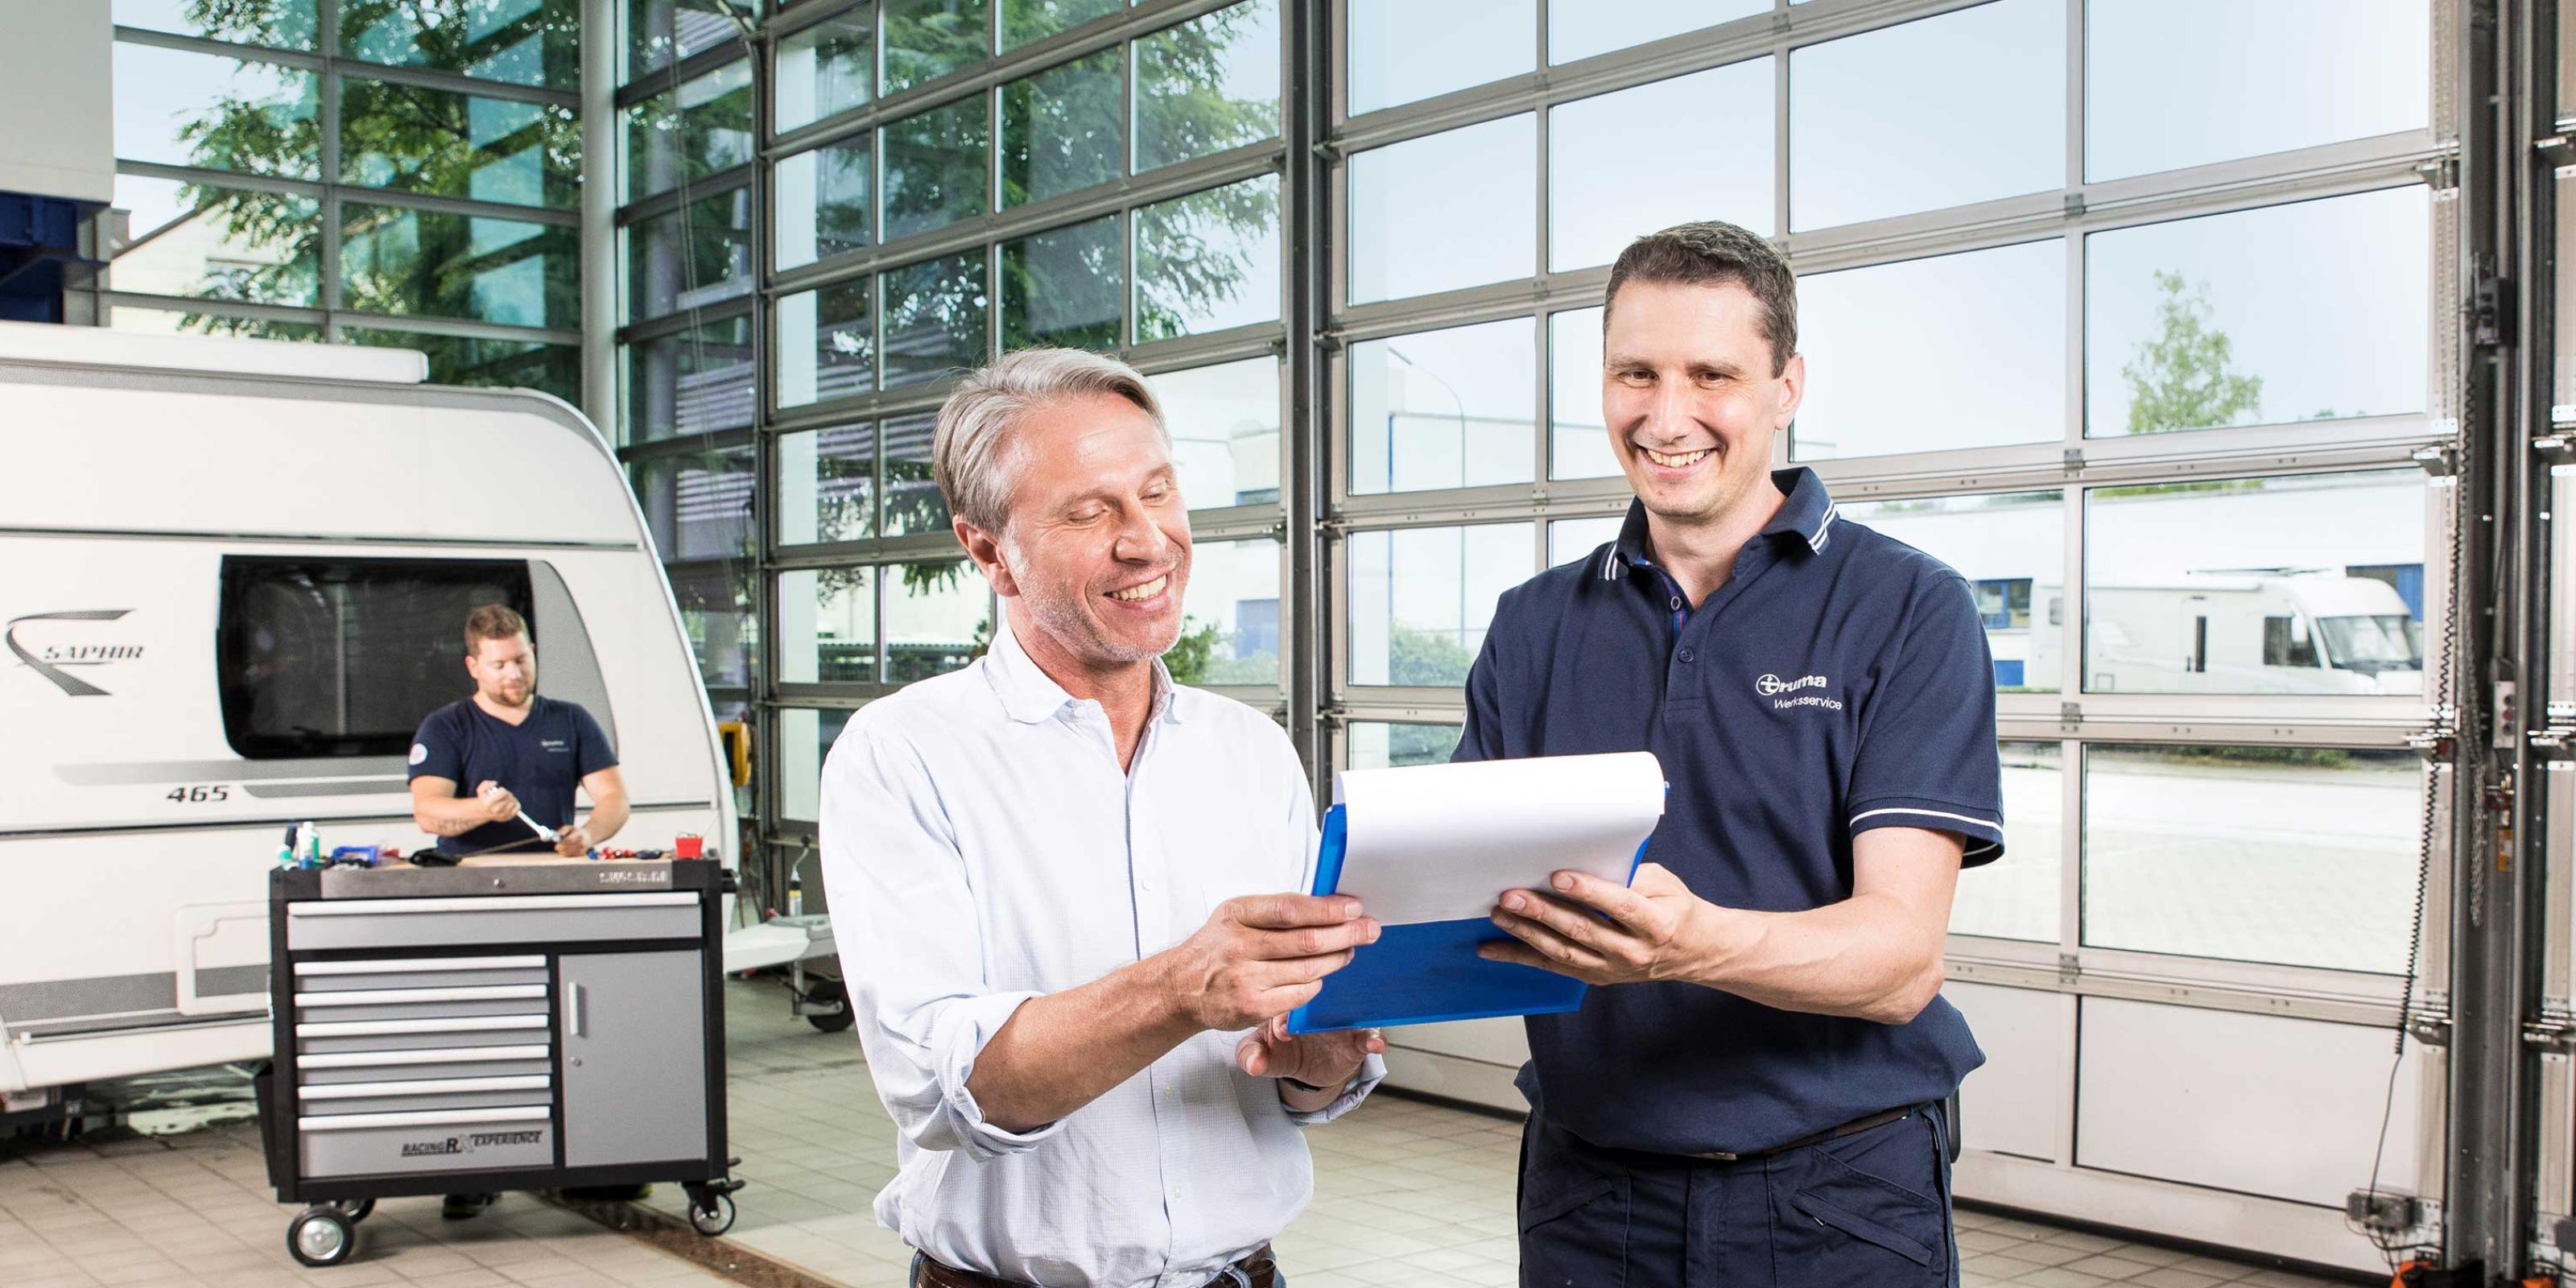 Truma employee shows a customer the workshop order